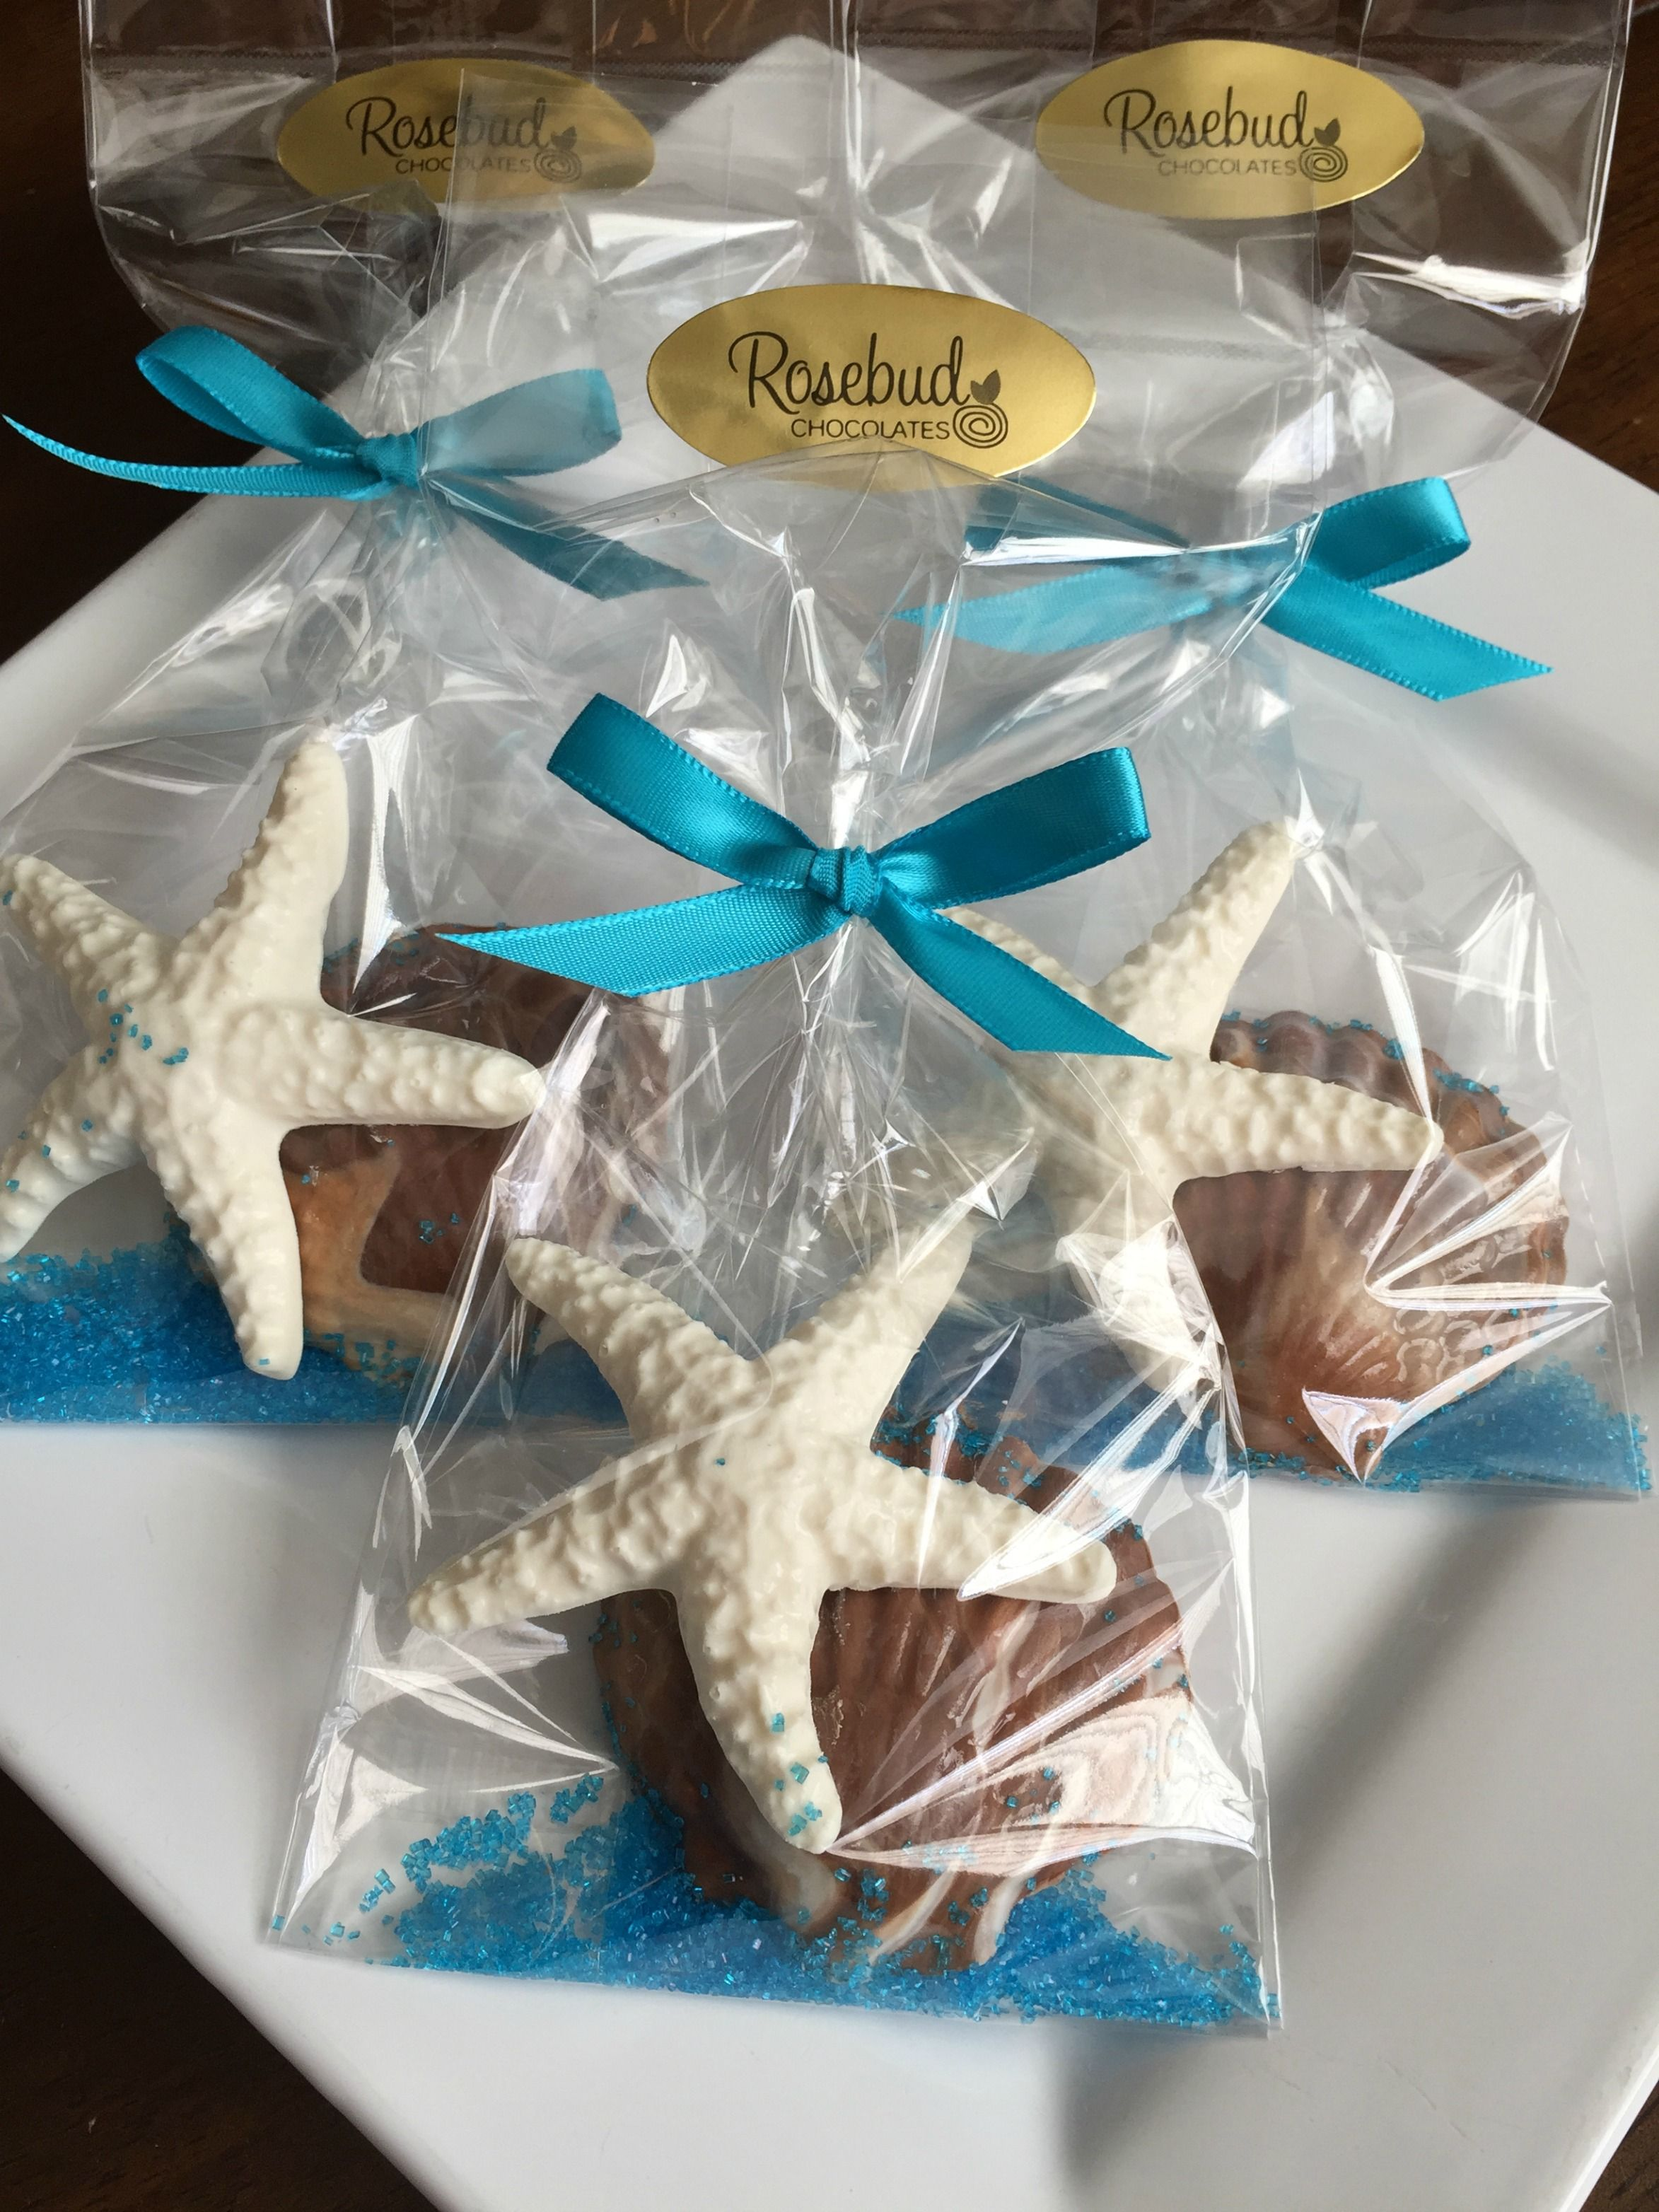 ideas for beach wedding party favors%0A Chocolate Starfish and Seashell Favors  Wedding  Bridal Shower   Anniversary  Birthday  Luau  Beach Theme DessertsBeach ThemesBeach